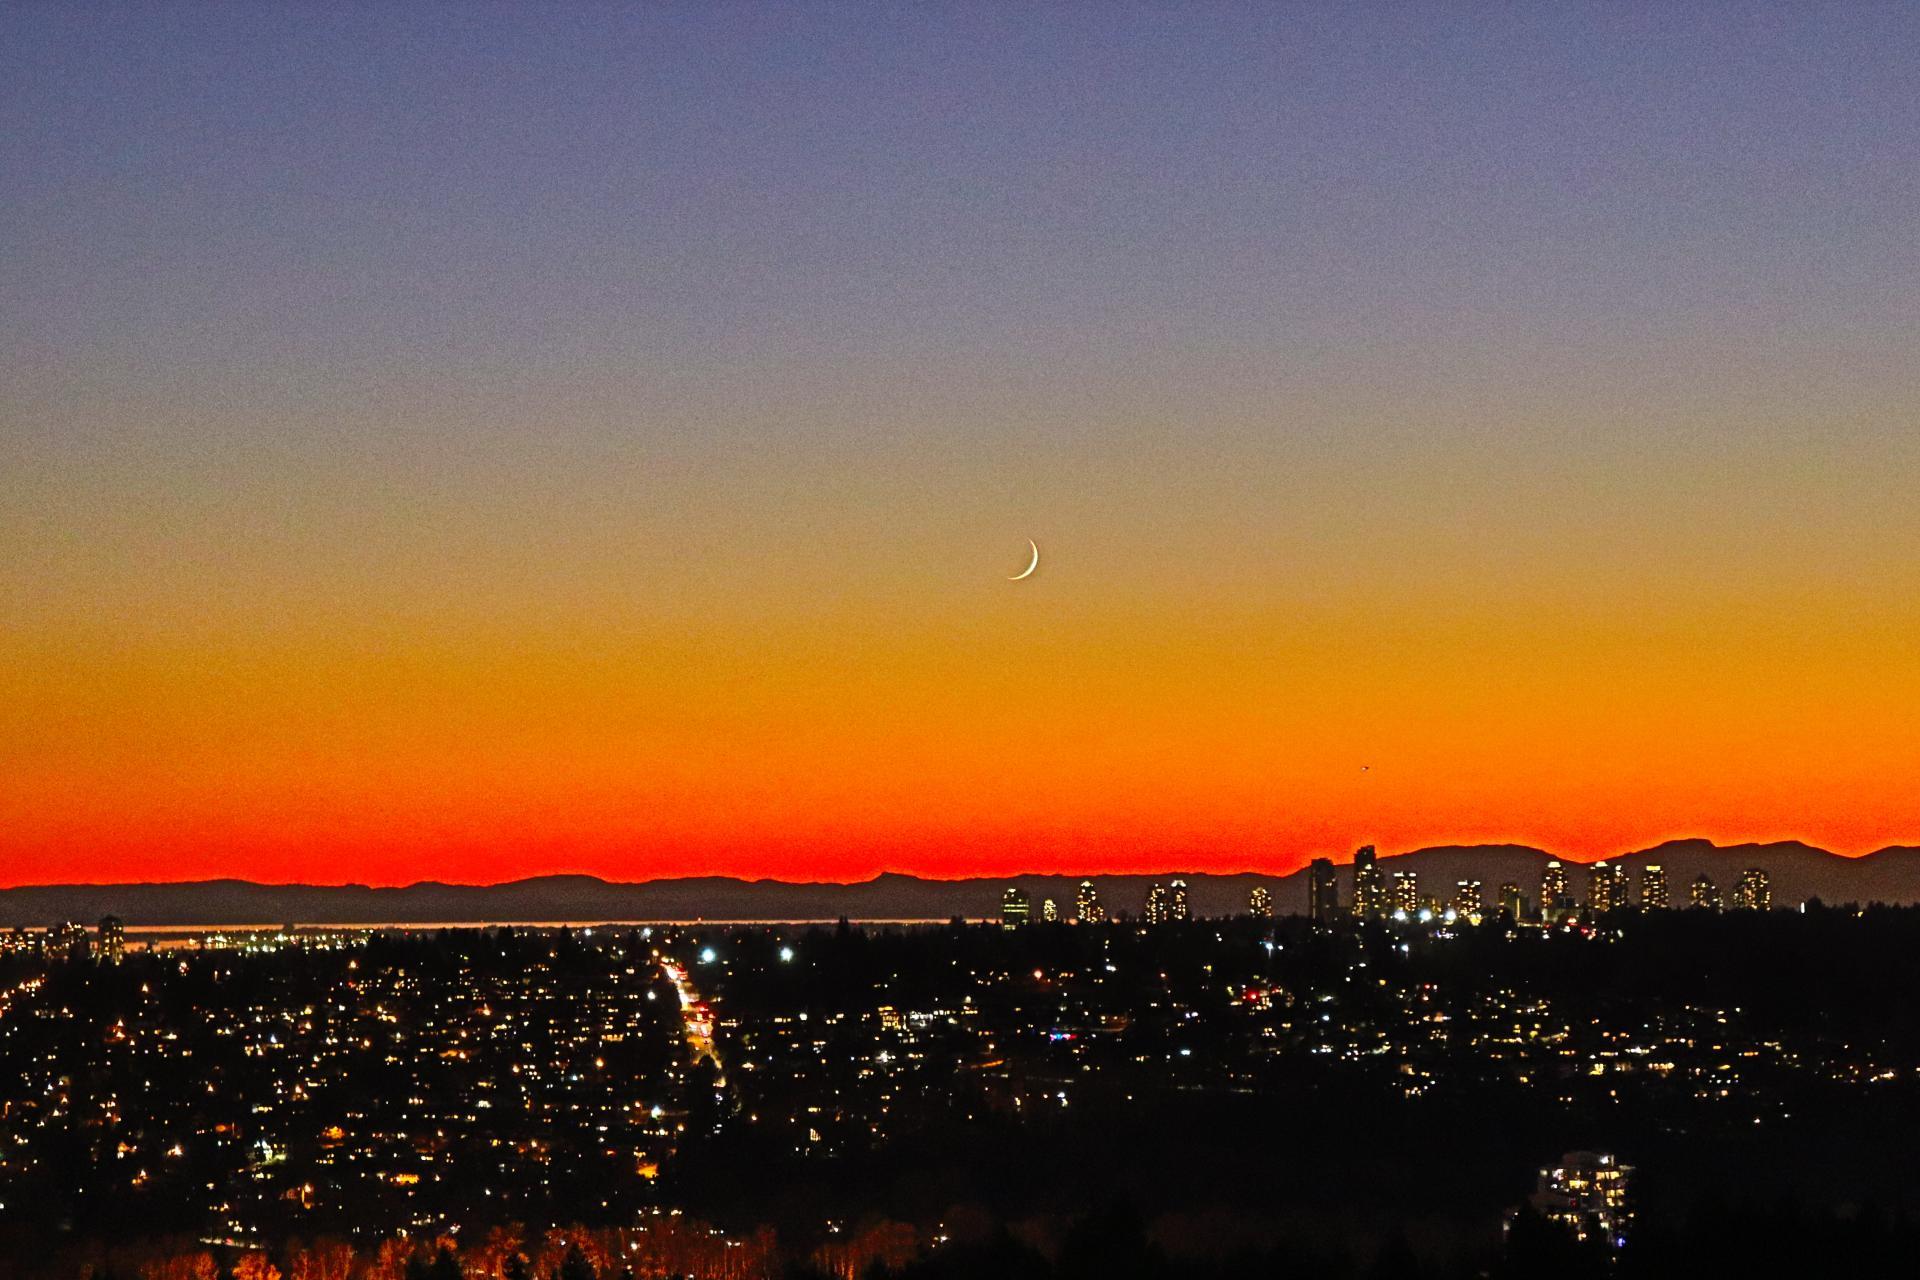 Moon over skyline